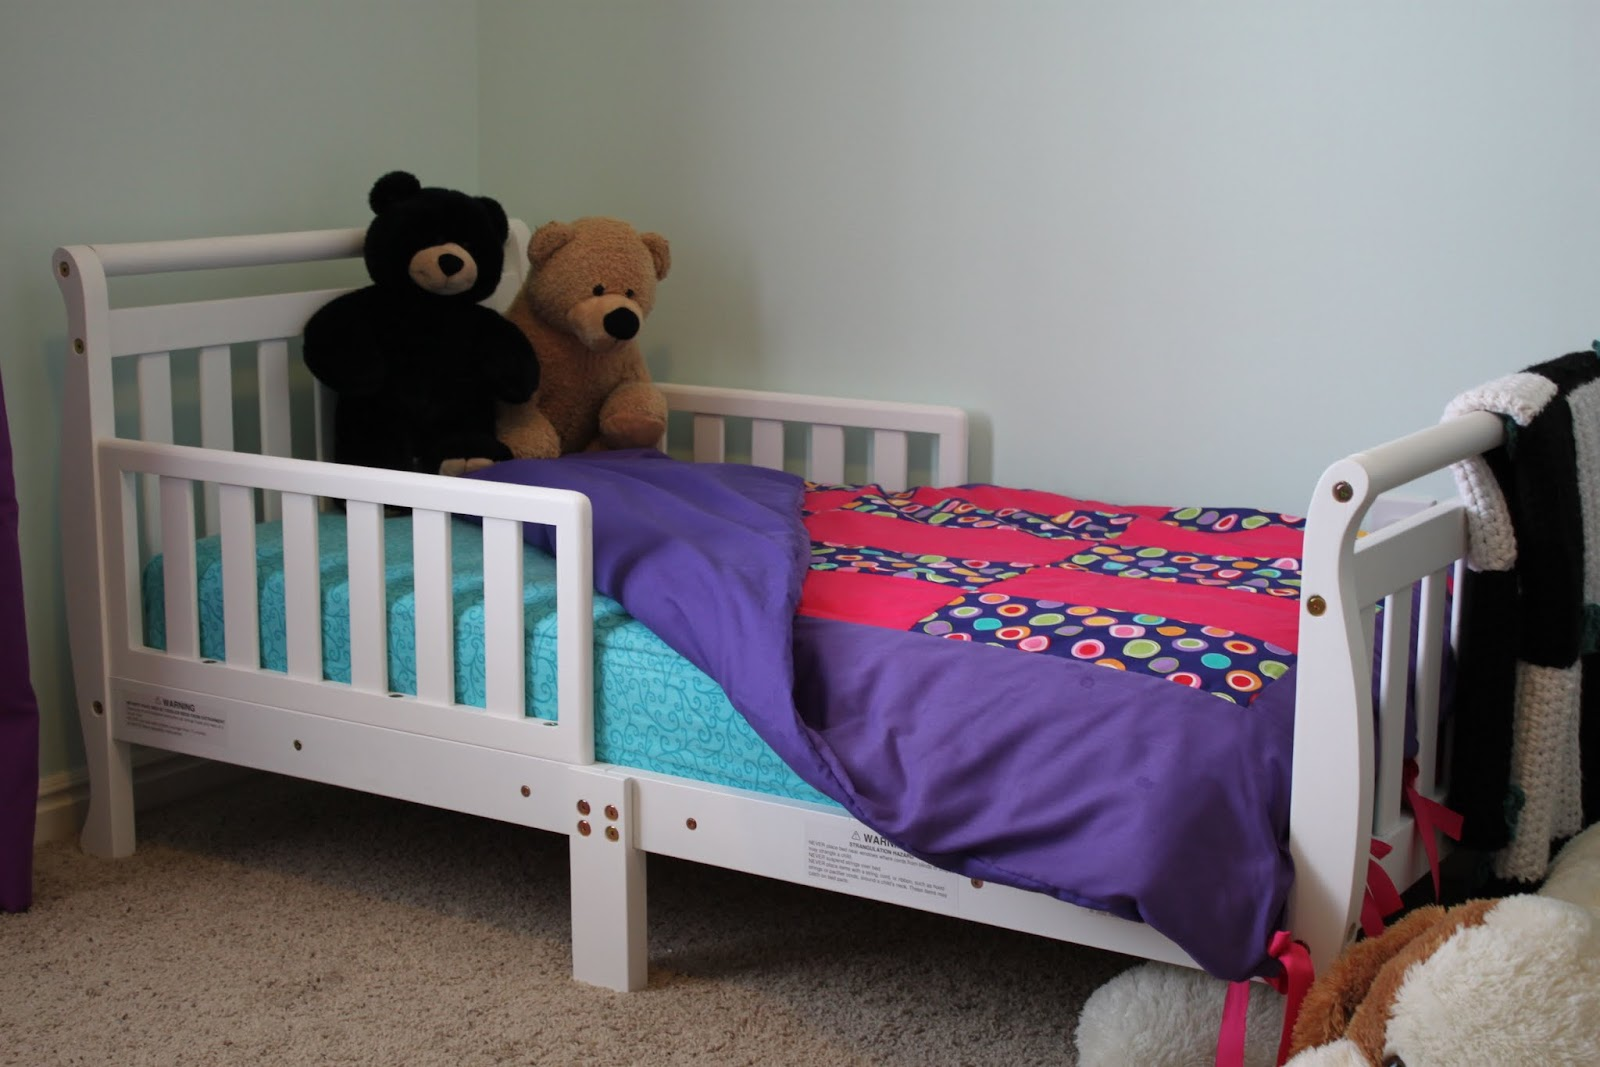 Notion 2 Craft Repurposed Bumper Pads Into Toddler Duvet